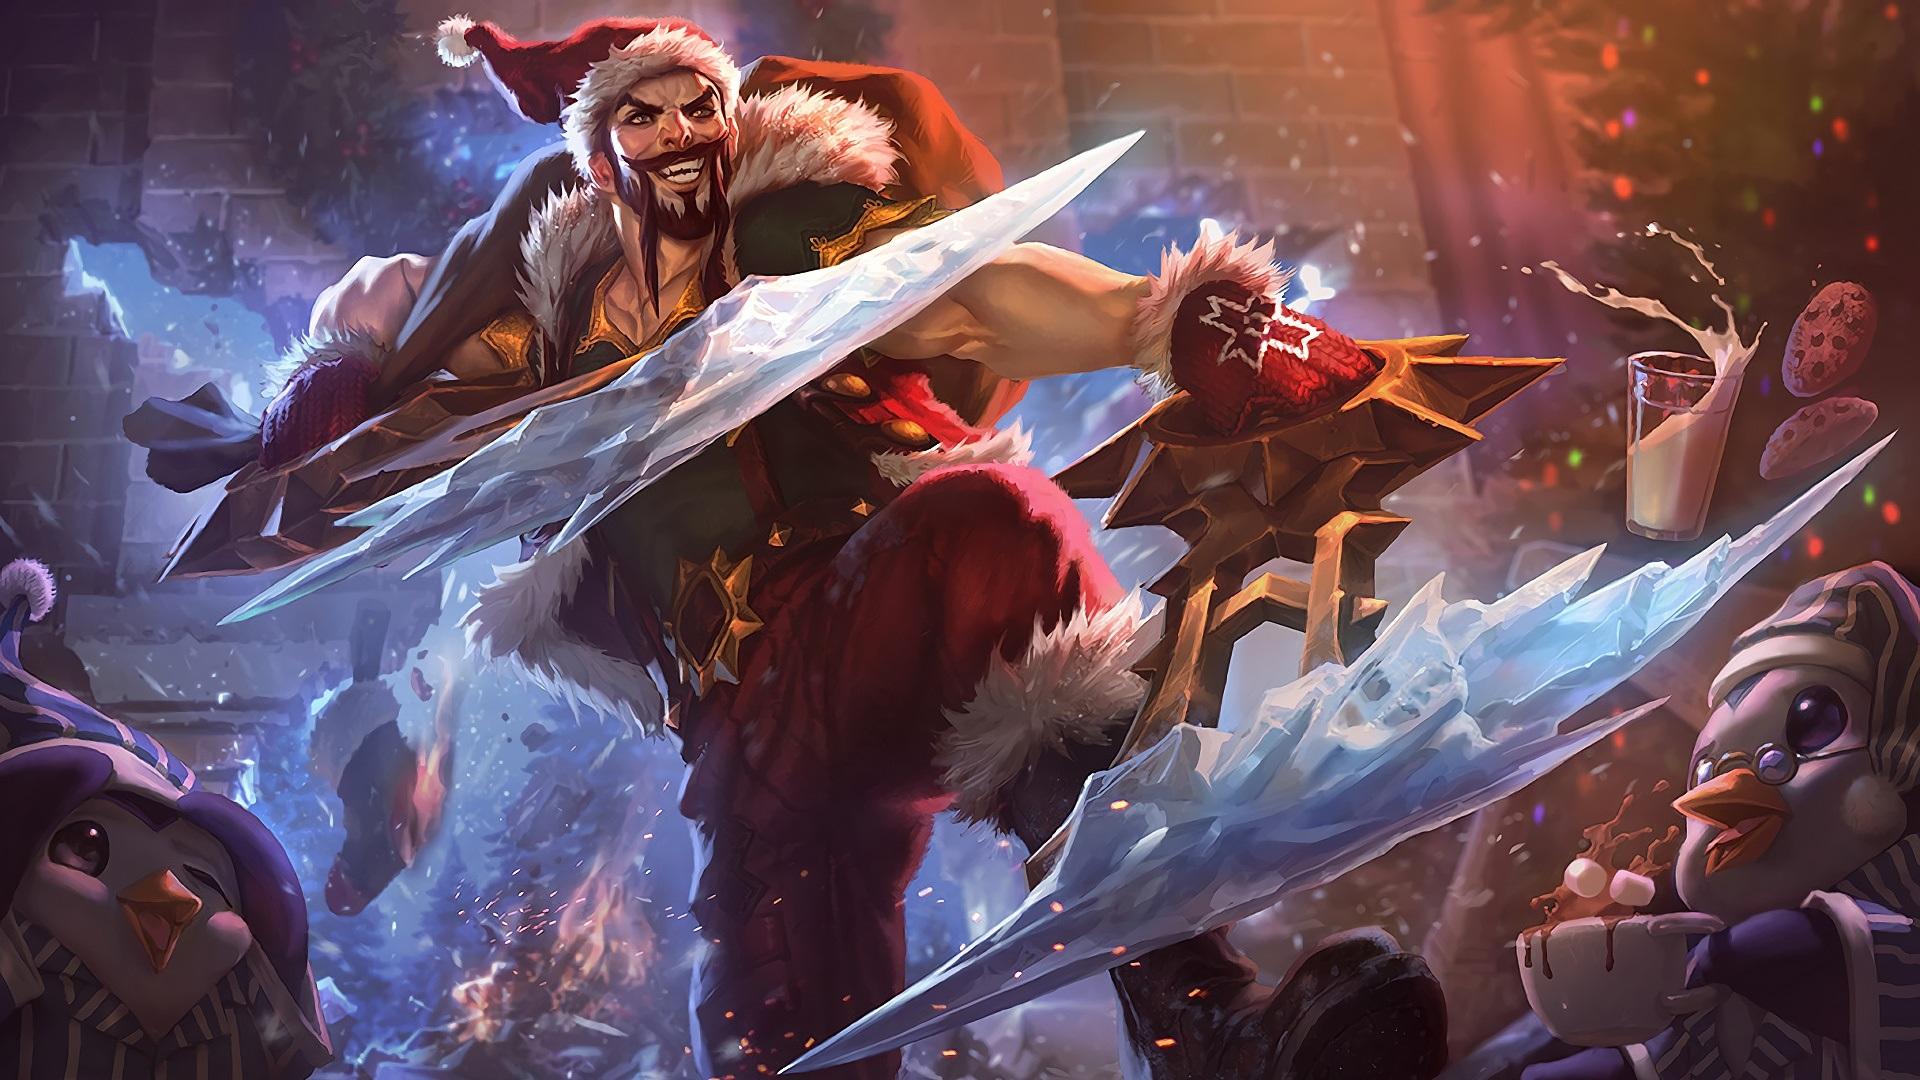 Wallpaper League Of Legends Santa Art Picture 1920x1080 Full Hd